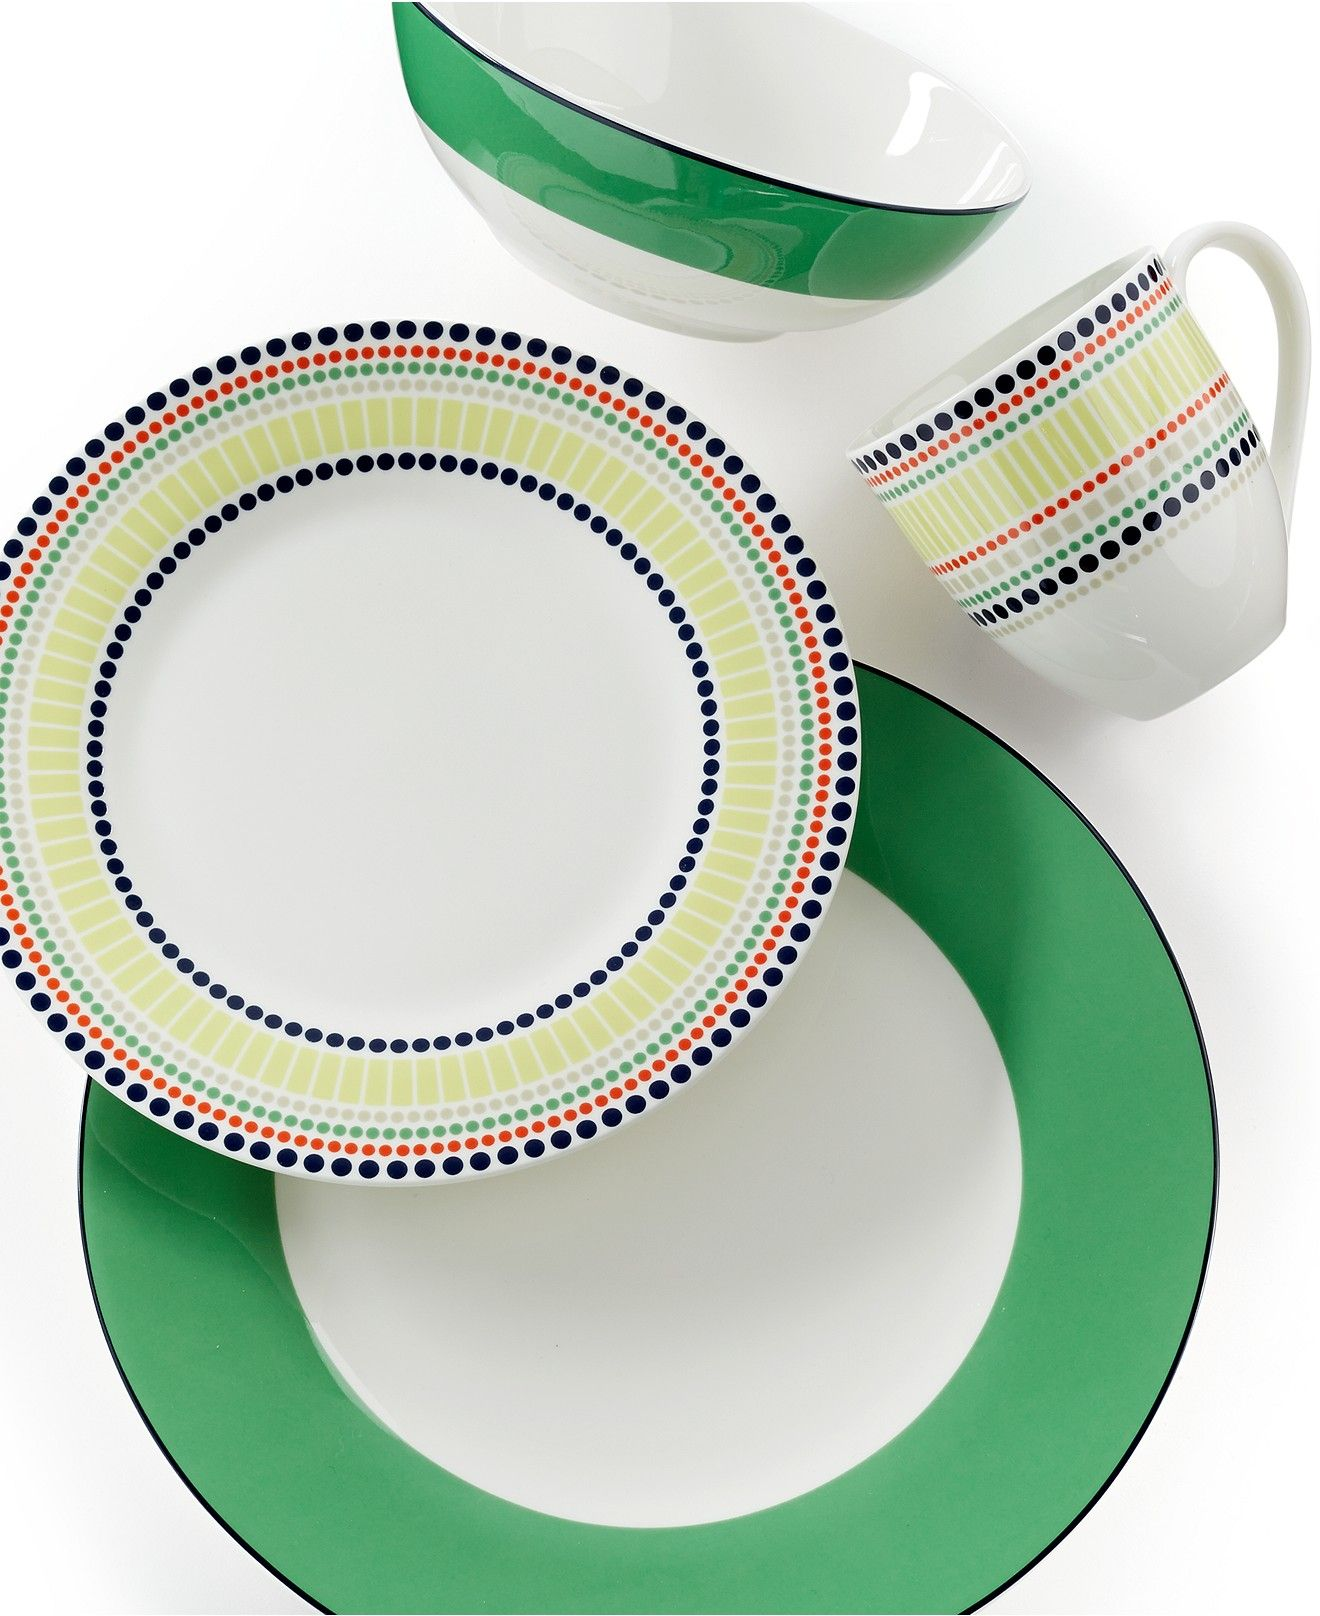 kate spade new york Dinnerware Hopscotch Drive Green Collection - Casual Dinnerware - Dining u0026 Entertaining - Macyu0027s  sc 1 st  Pinterest & kate spade new york Dinnerware Hopscotch Drive Green Collection ...